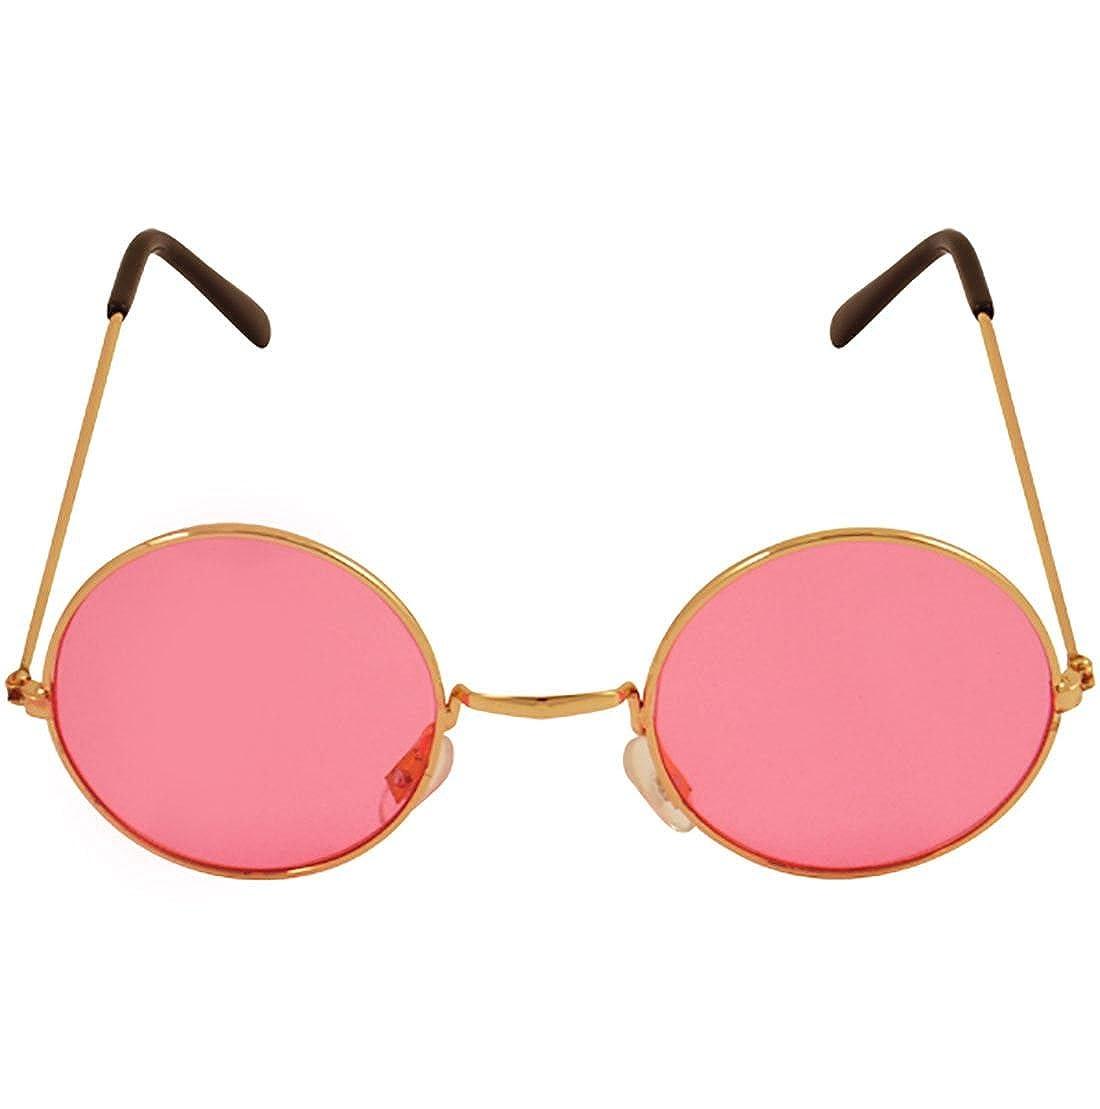 Amazon.com: Marco de oro unisex con lentes rosas para ...